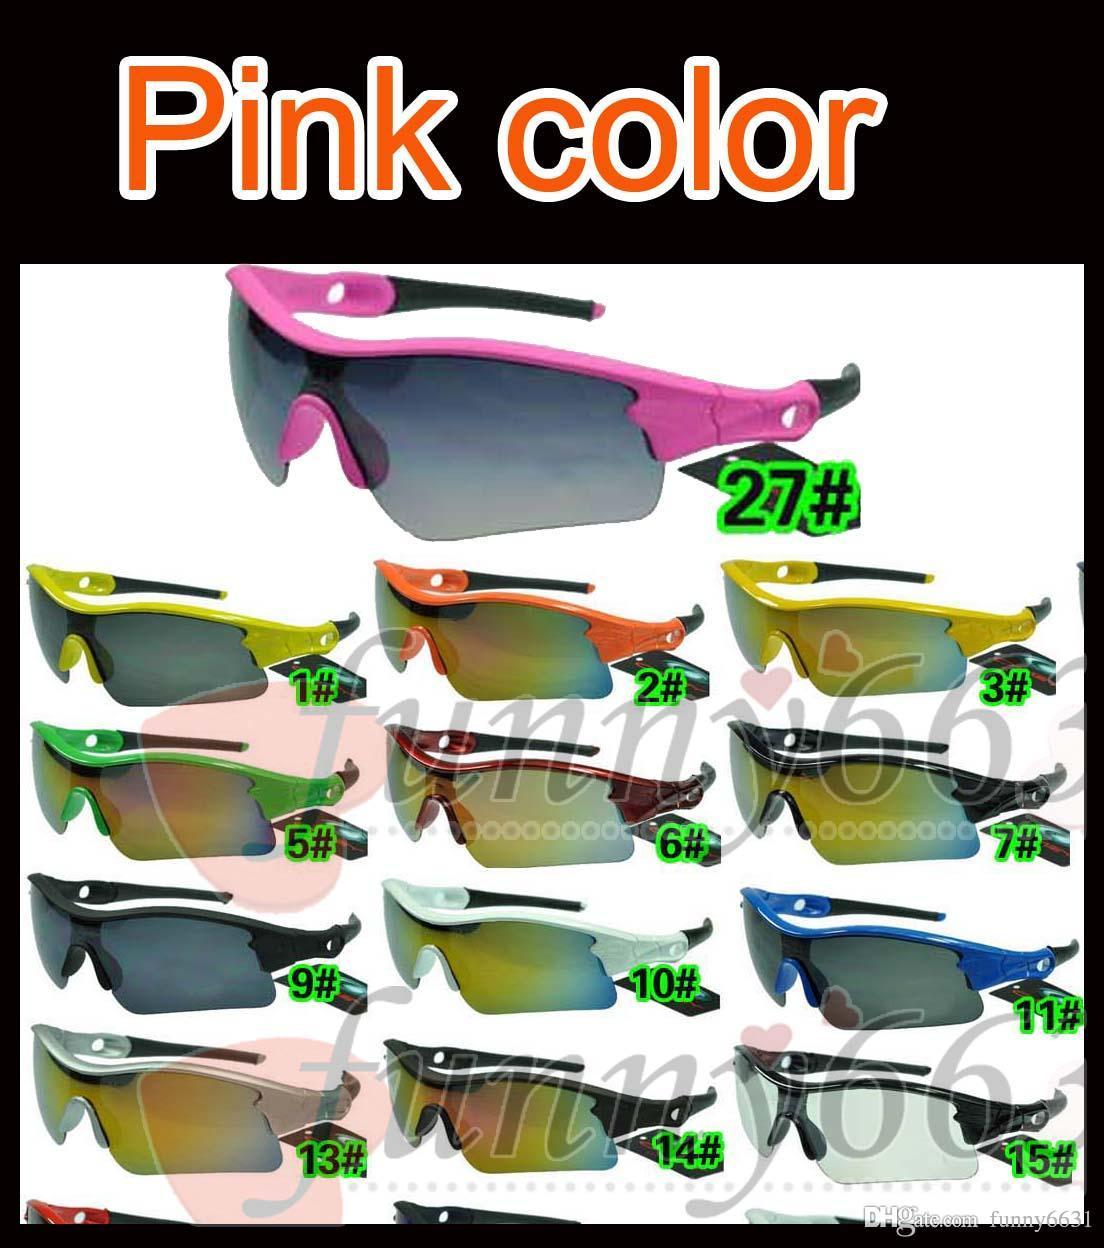 Hot الرجال الرياضة نظارات دراجة زجاج outdoor نظارات الوردي الدراجات نظارات الموضة انبهار اللون المرايا a + + 29 ألوان شحن مجاني